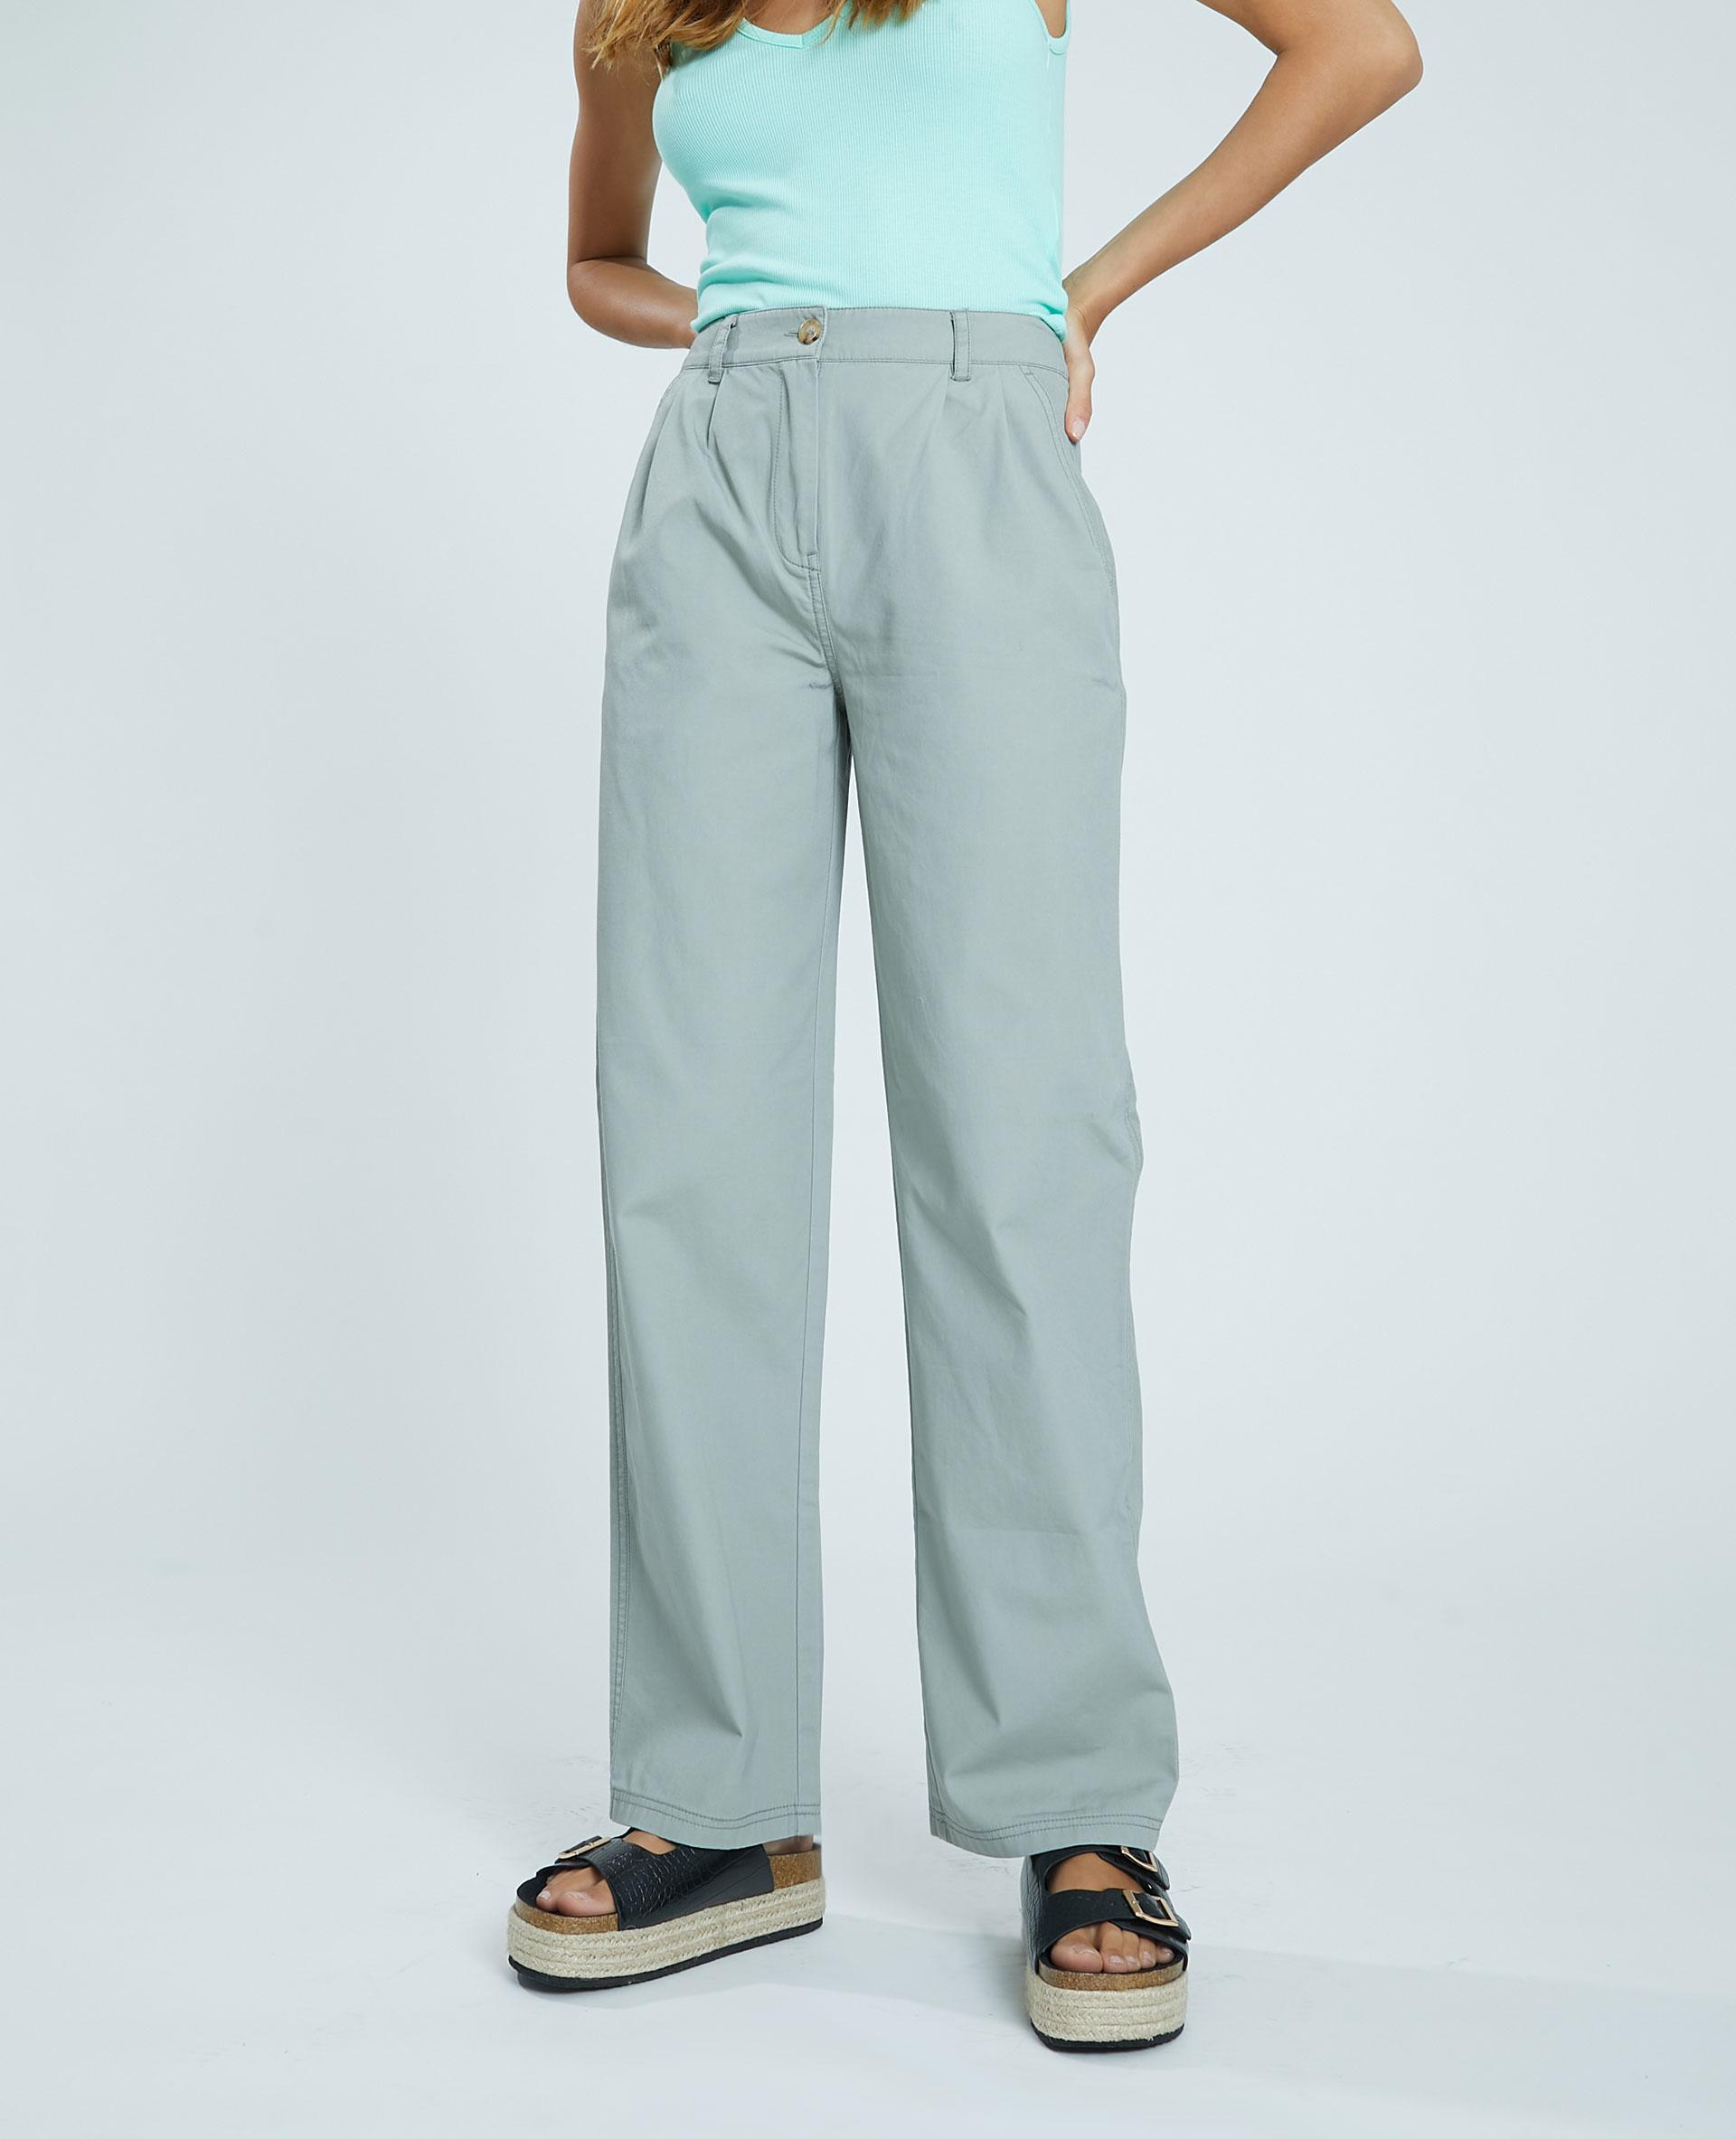 Pantalon en toile kaki - Pimkie